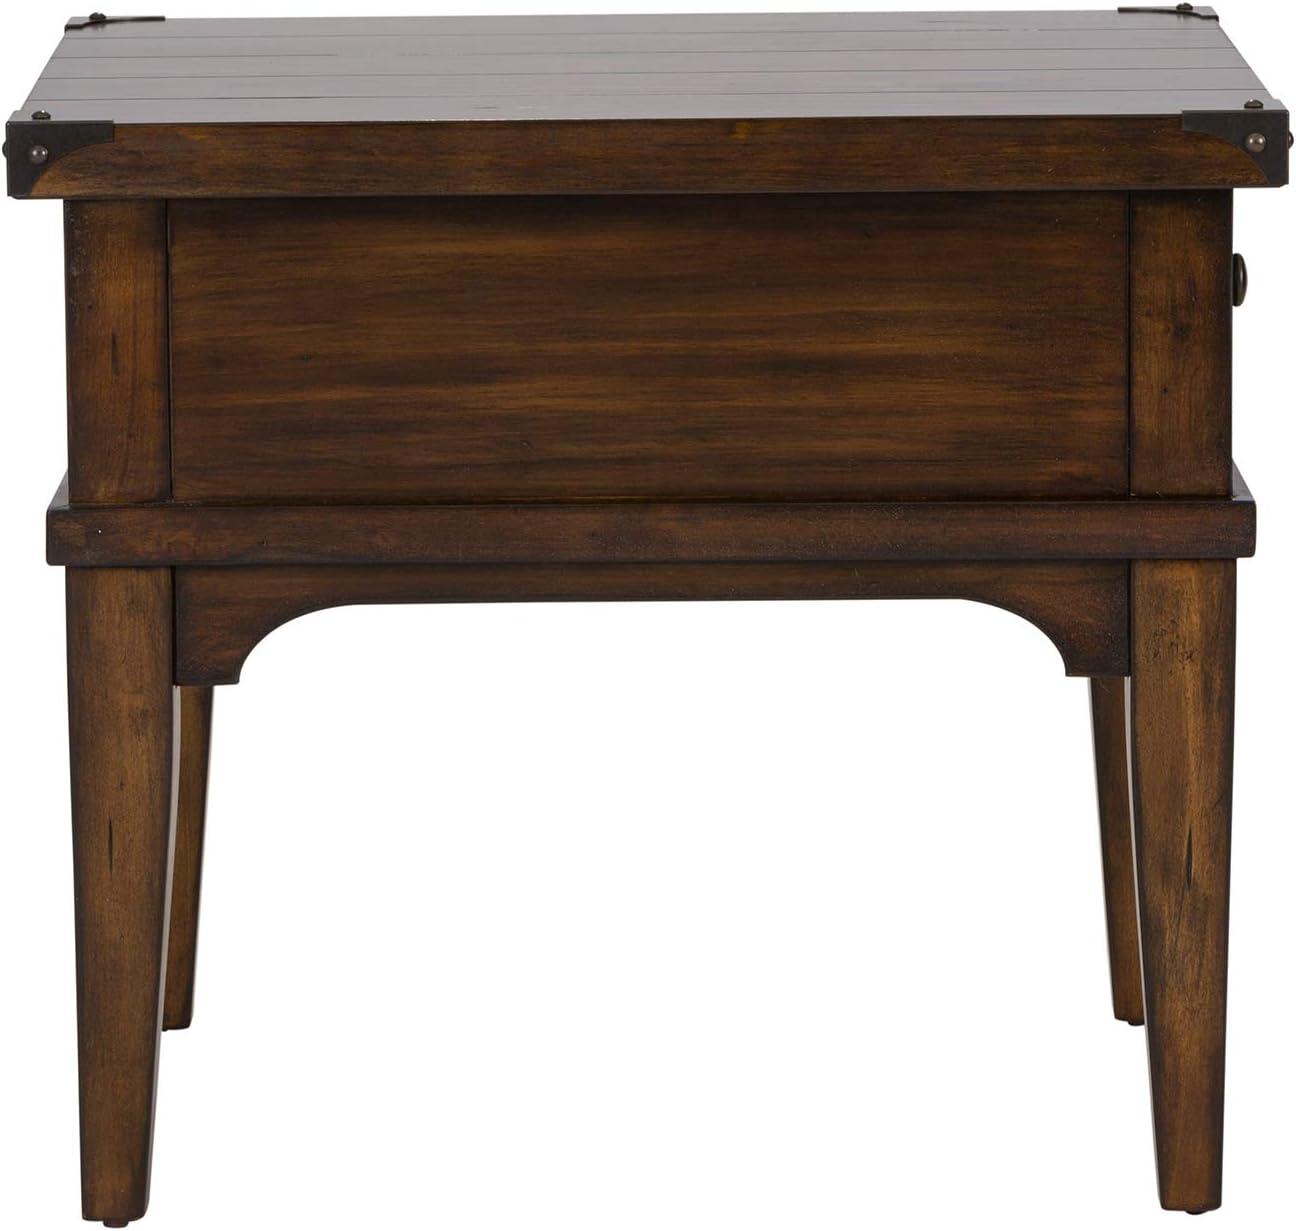 Liberty Furniture Industries Aspen Skies End Table, 23